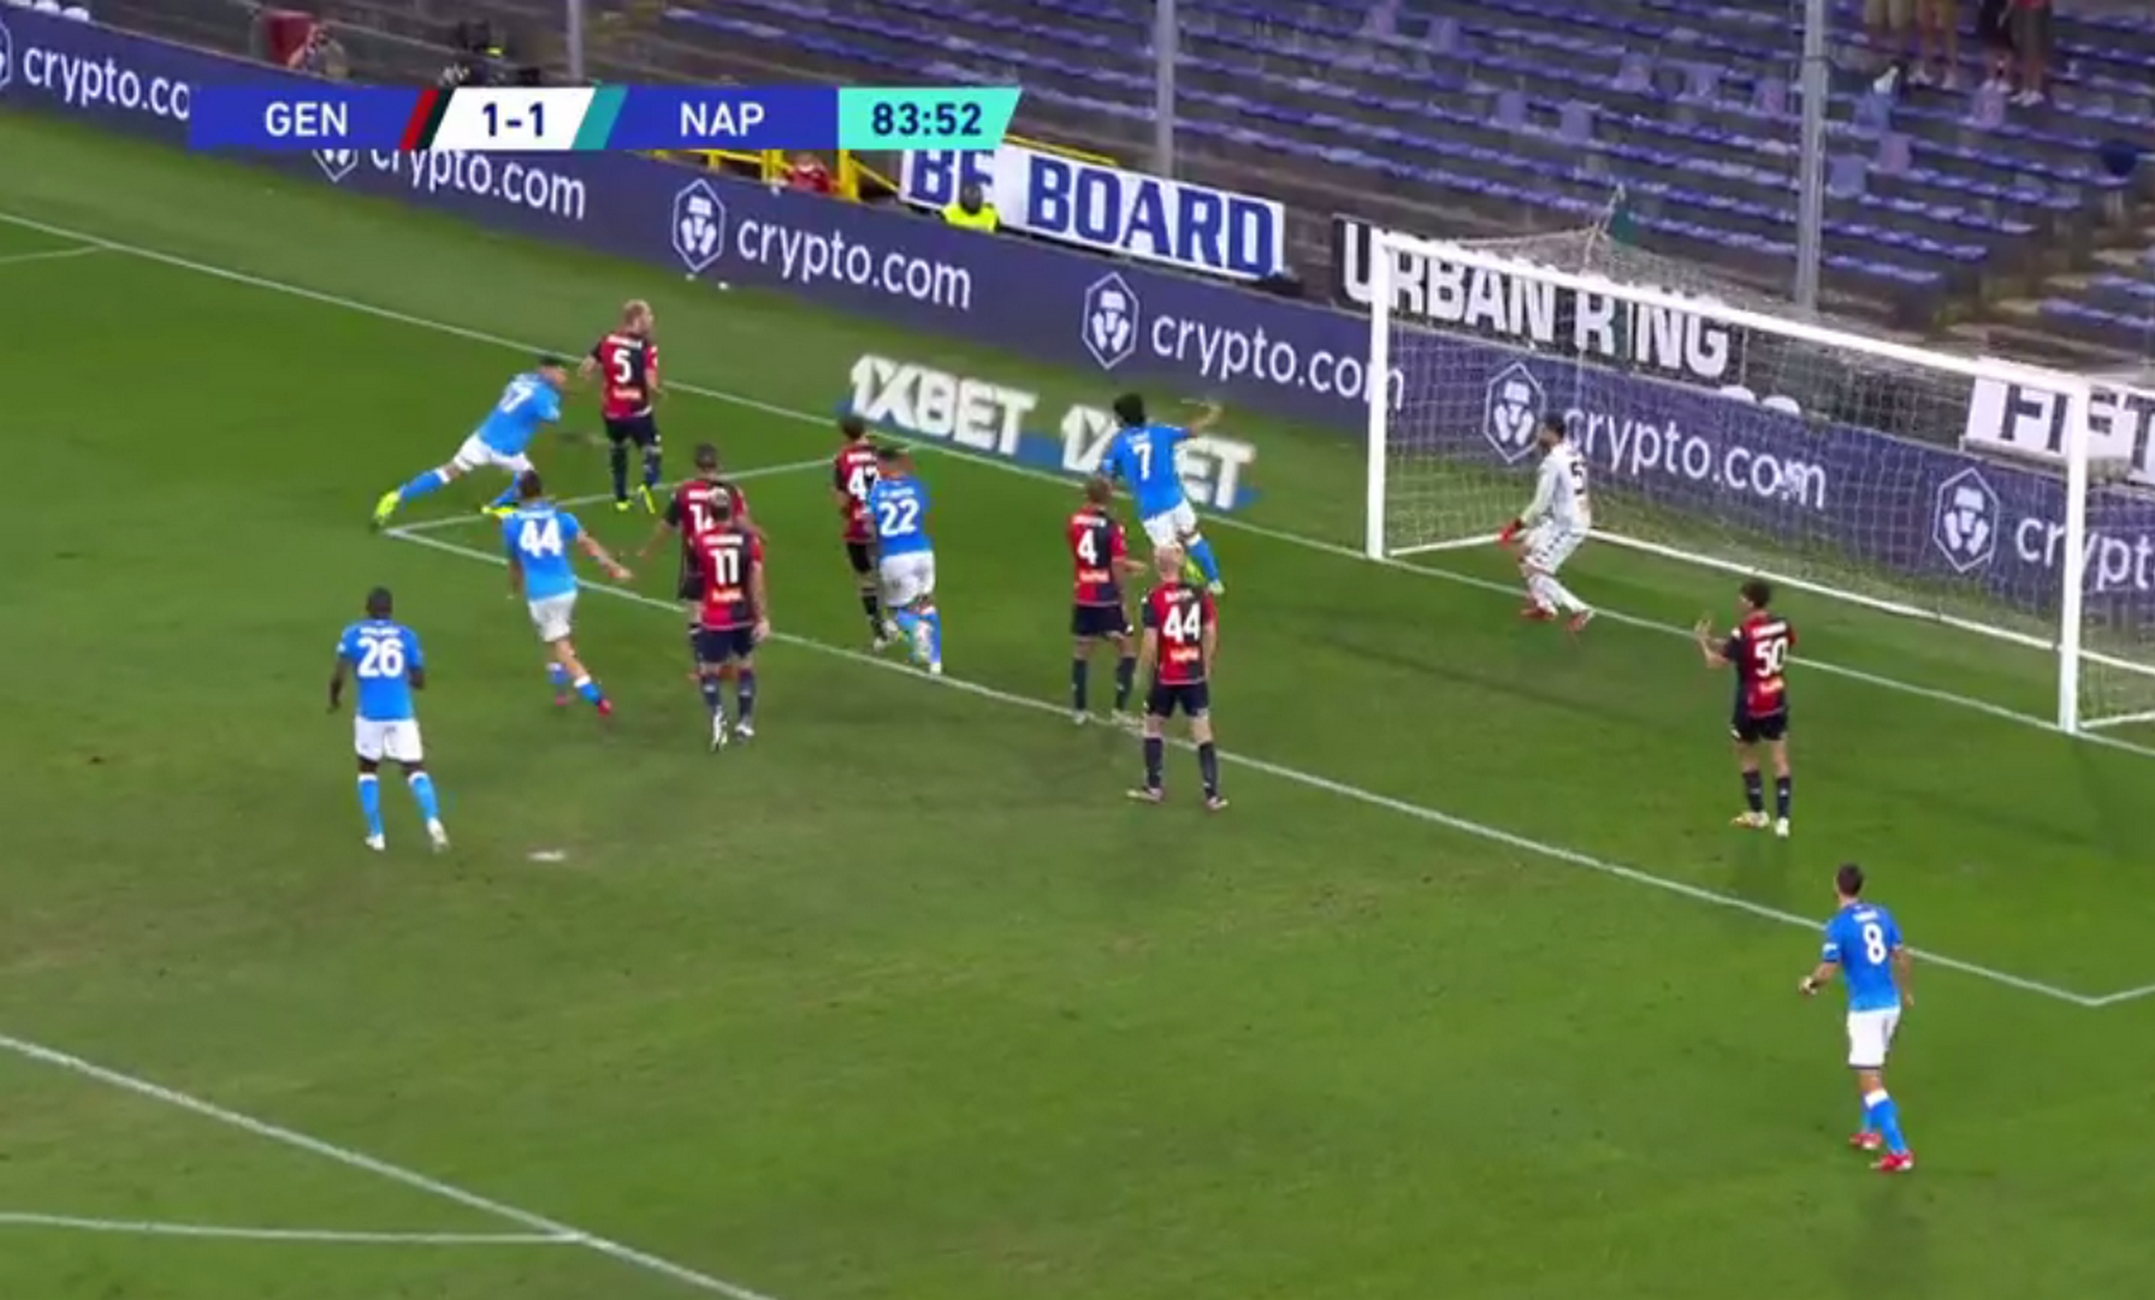 Serie A: Διπλό και κορυφή για τη Νάπολι του Μανωλά